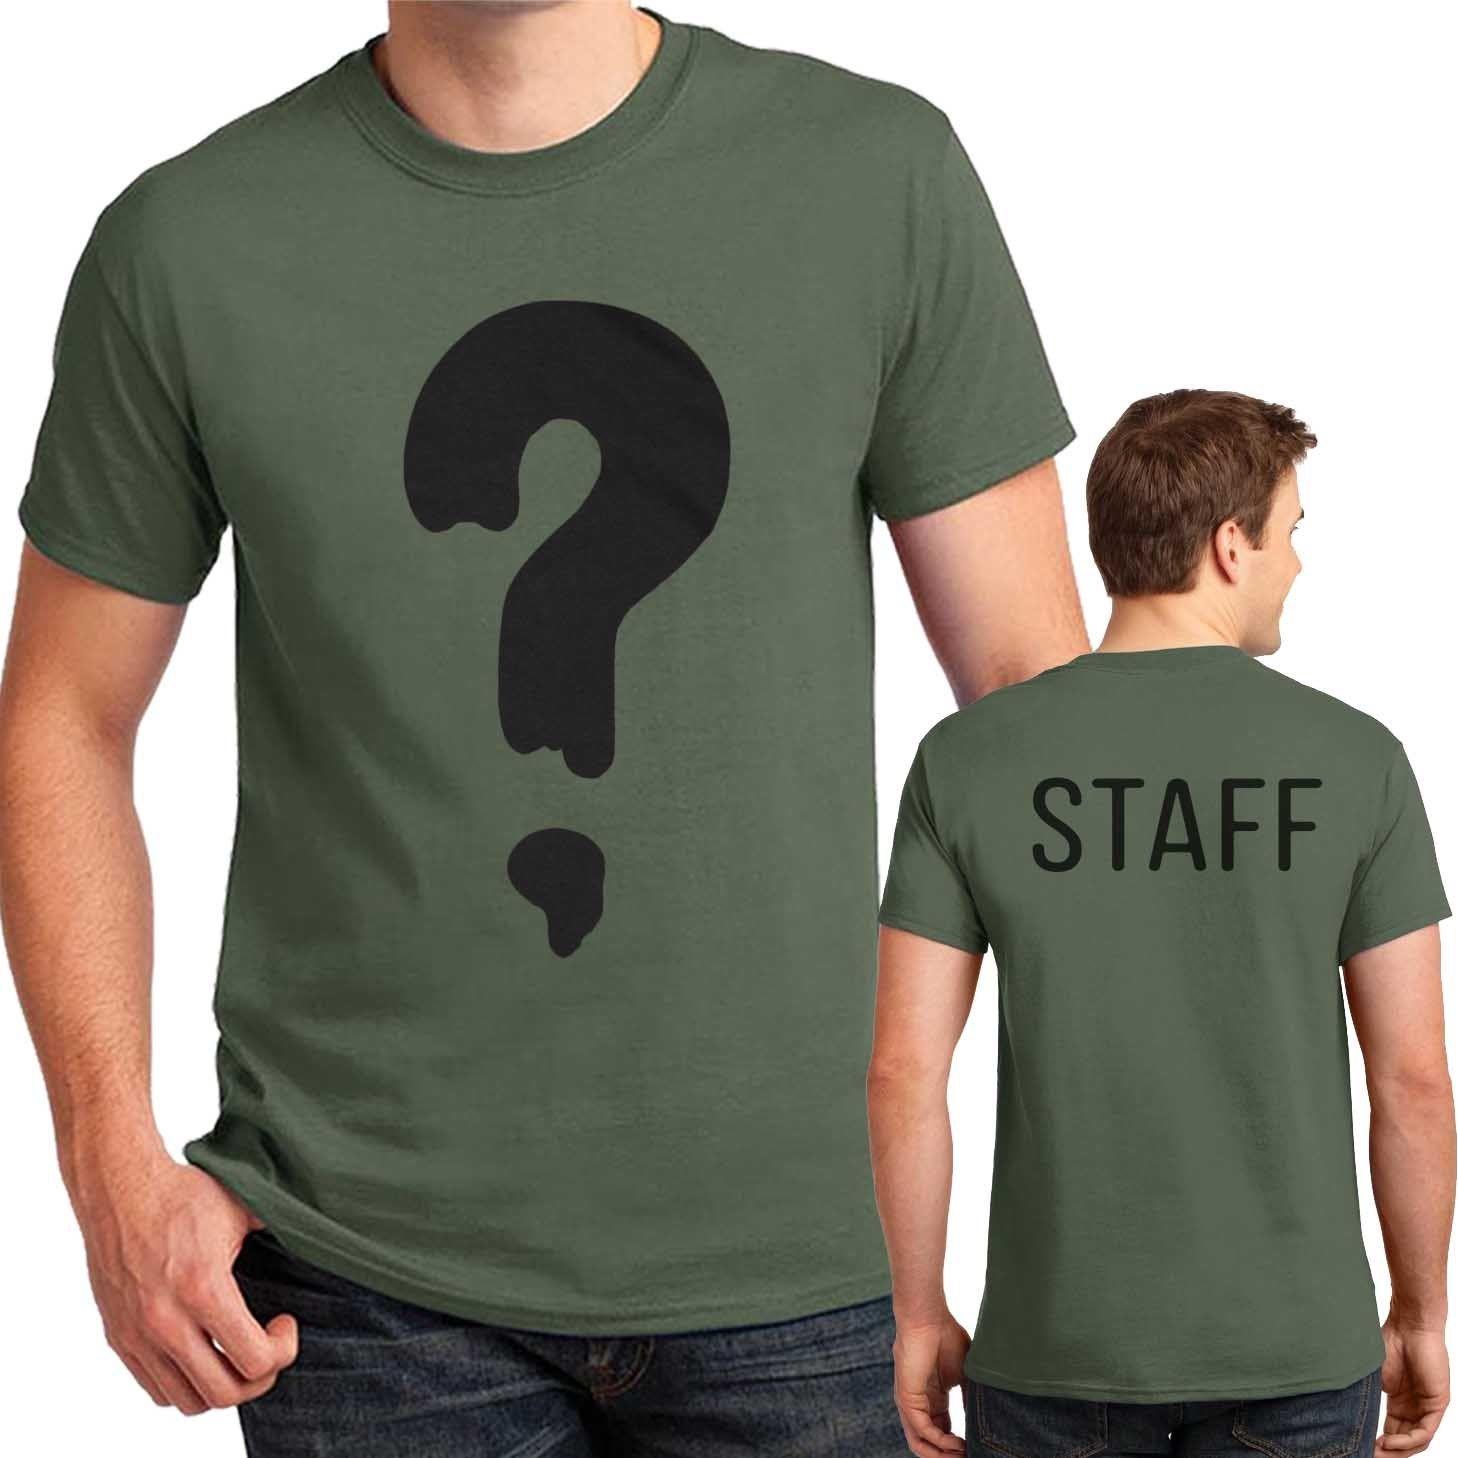 Soos Ramirez T-shirt Gravity Falls Pines Halloween Costume Shirts Mens Size 3D Men Hot Cheap Short Sleeve Male T Shirt